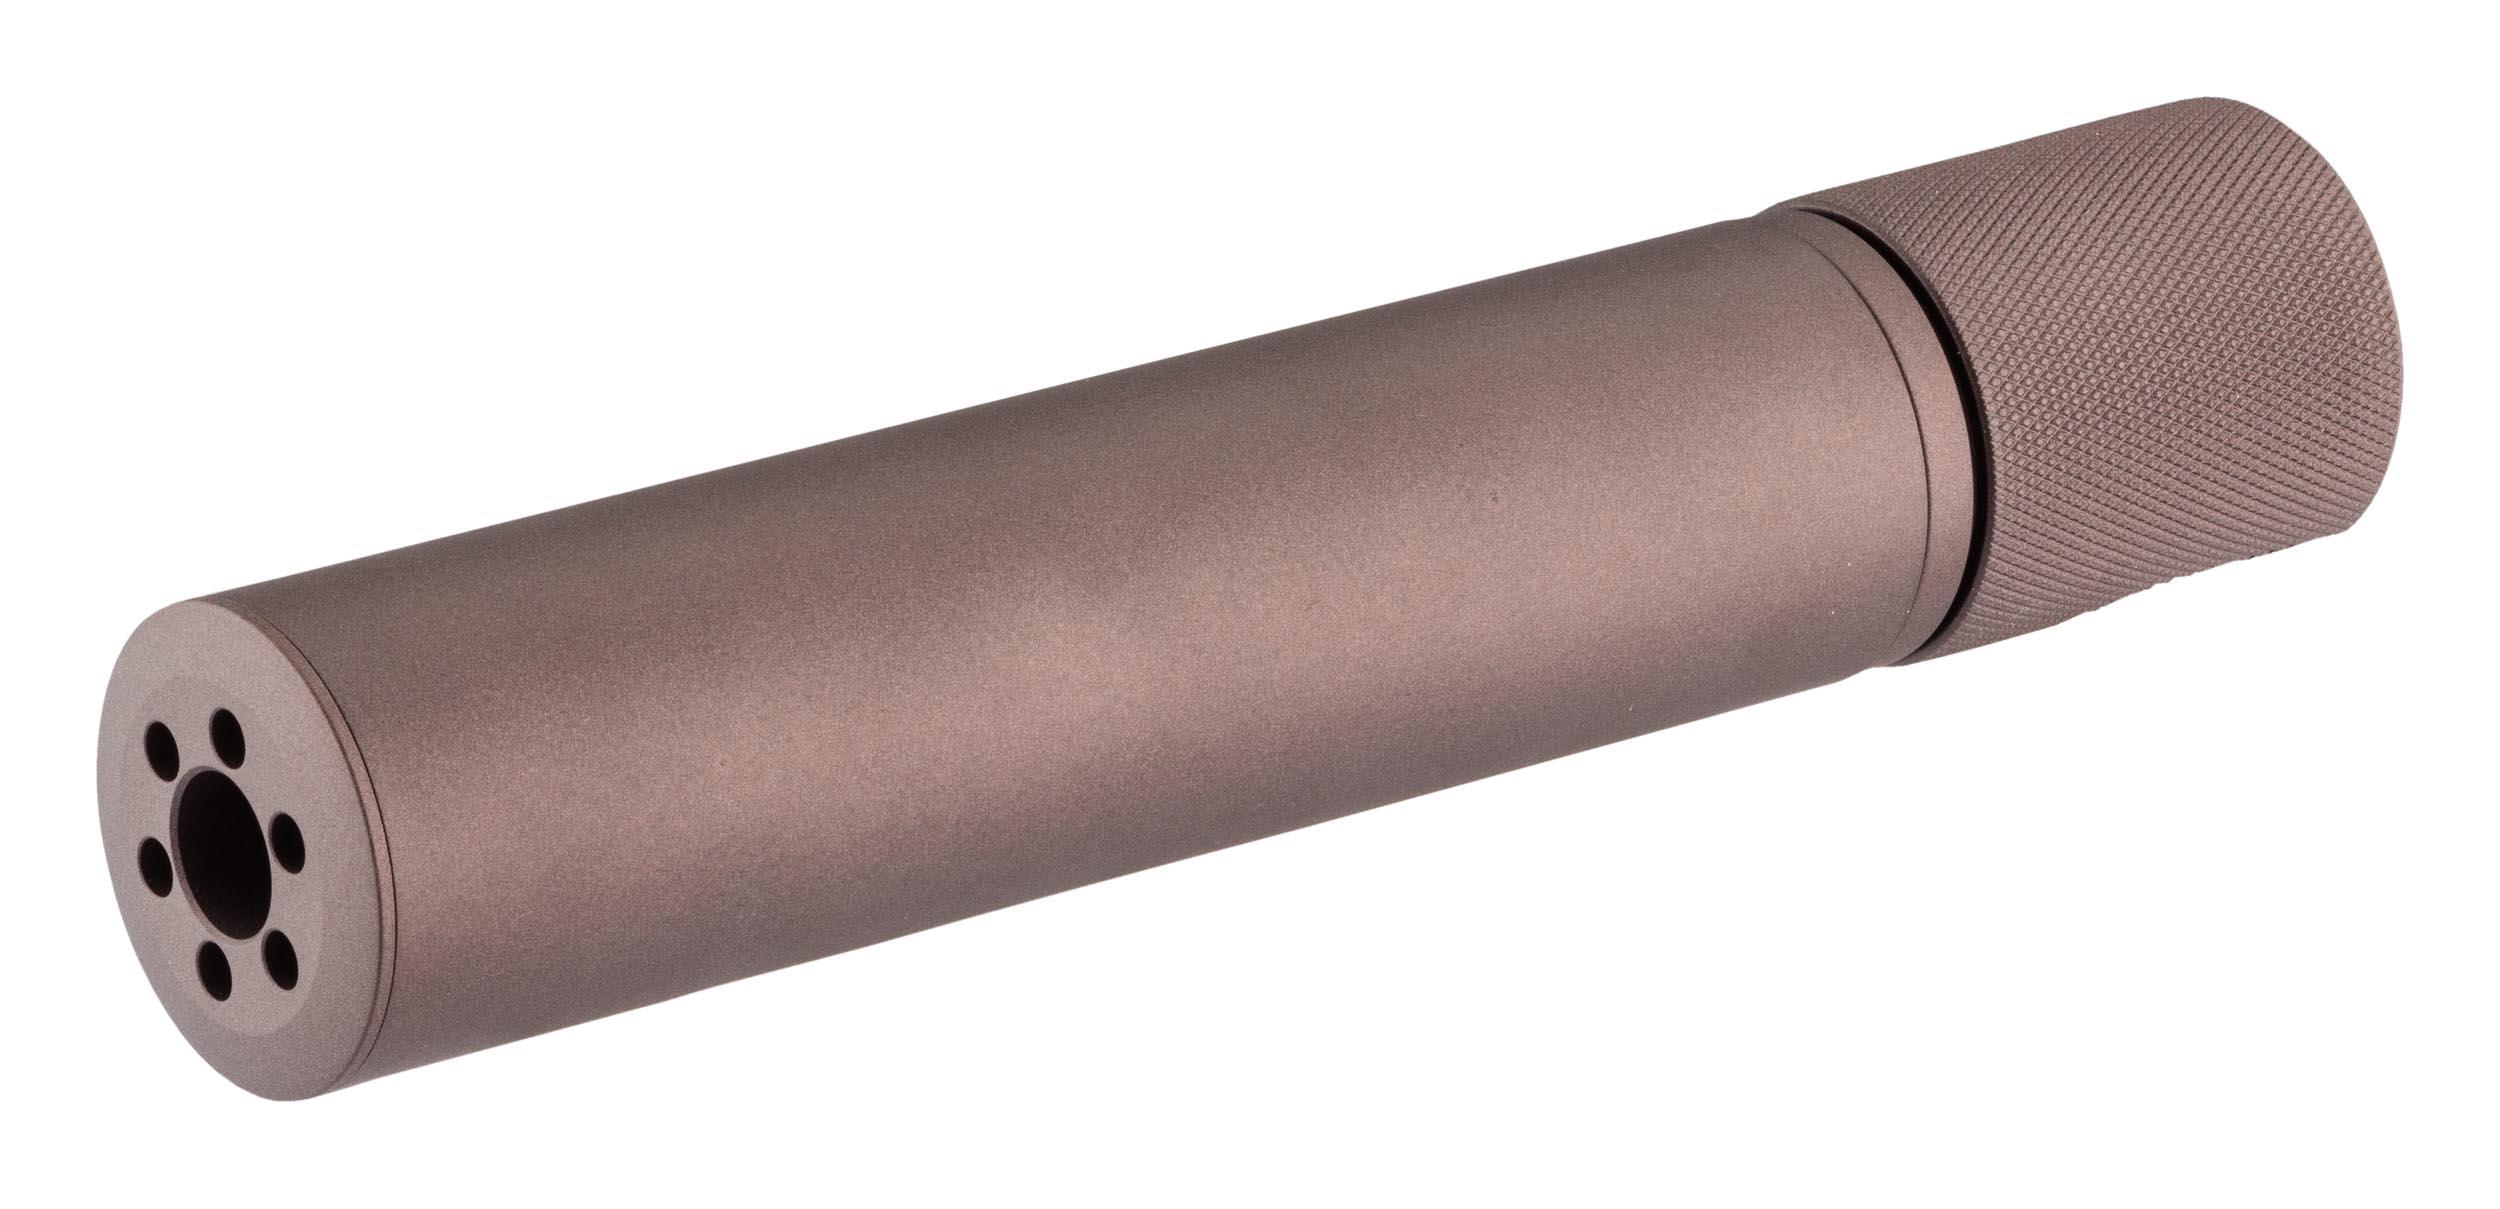 PU02003-4 Gap Style QD Silencer FDE - PU02003